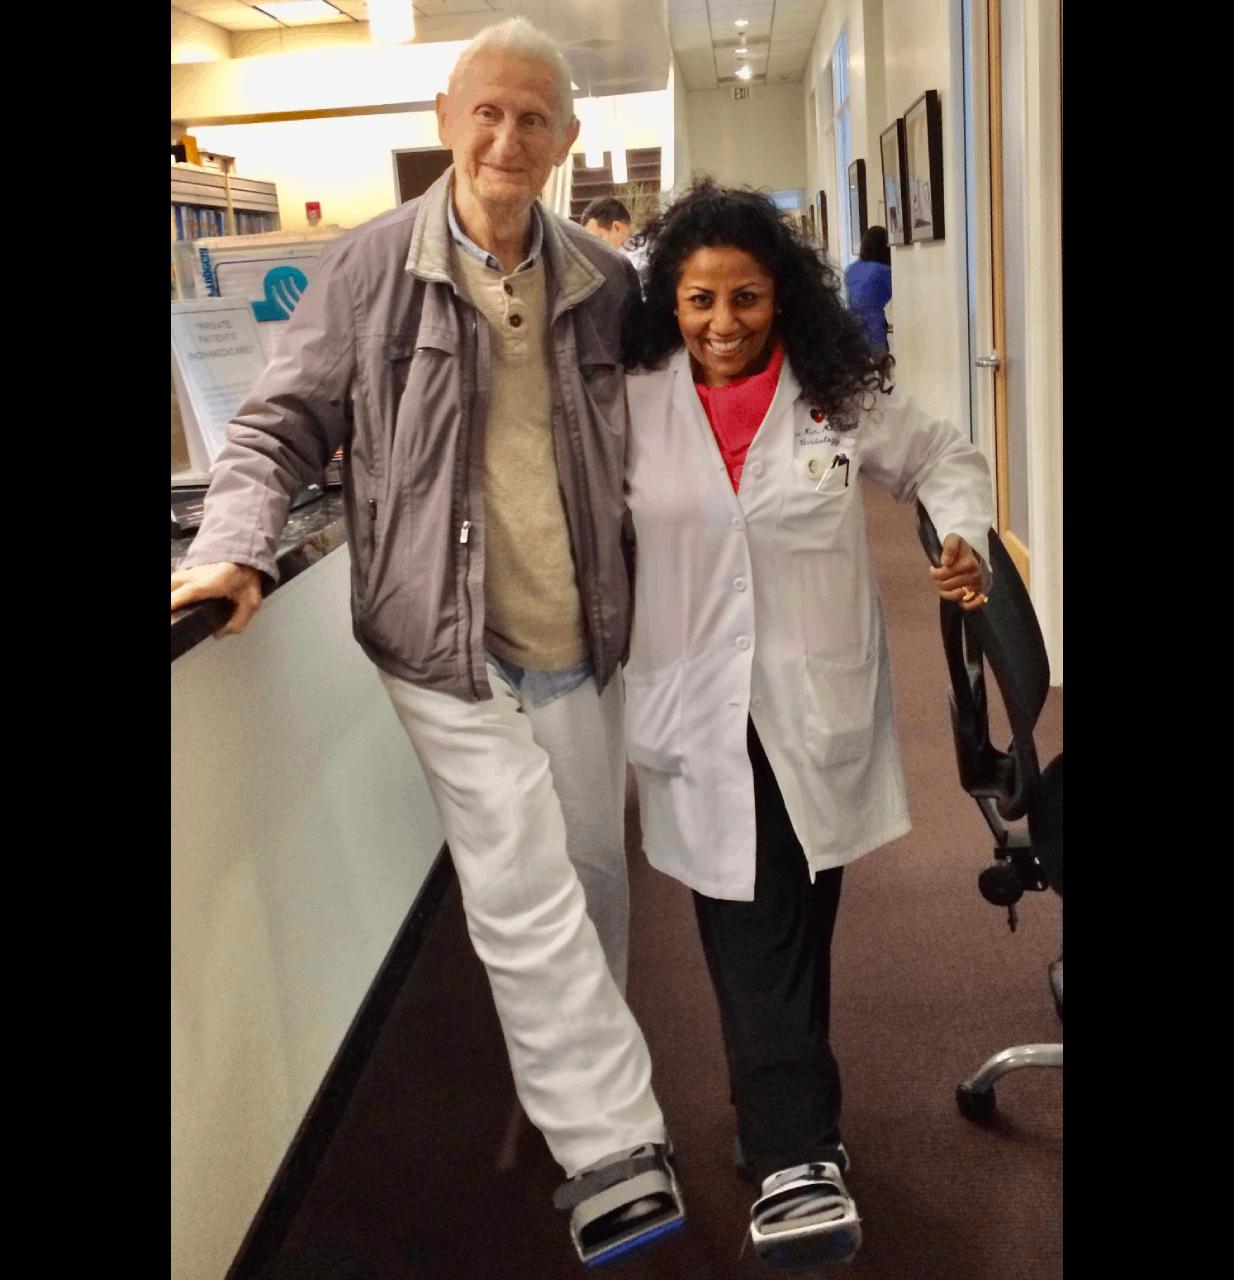 Sheila Kar with happy patient photo #3